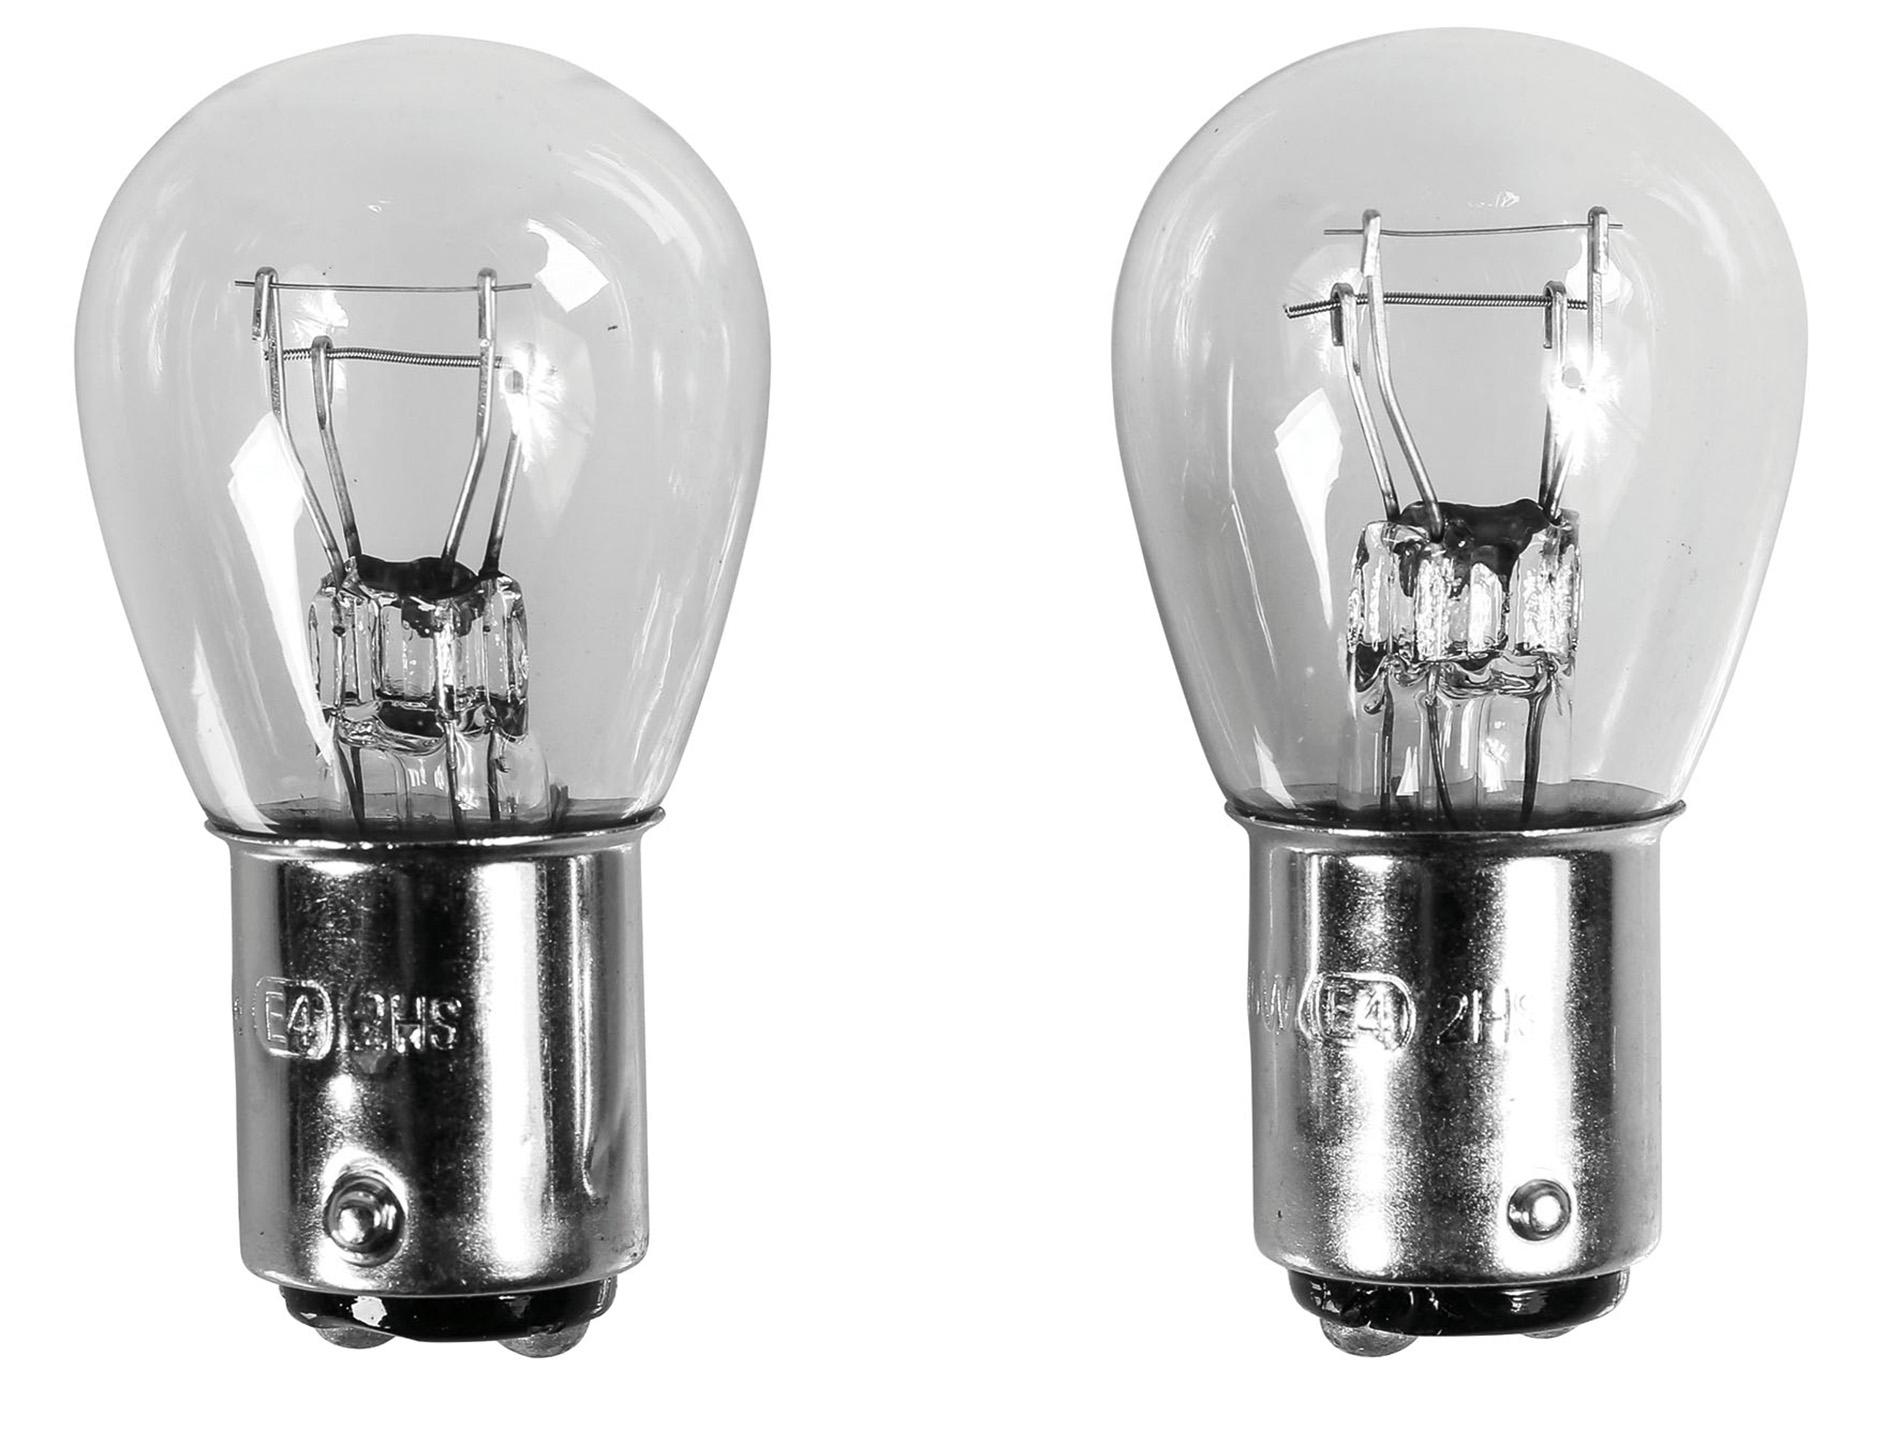 ampoule bifil 12v p21 5w x2. Black Bedroom Furniture Sets. Home Design Ideas